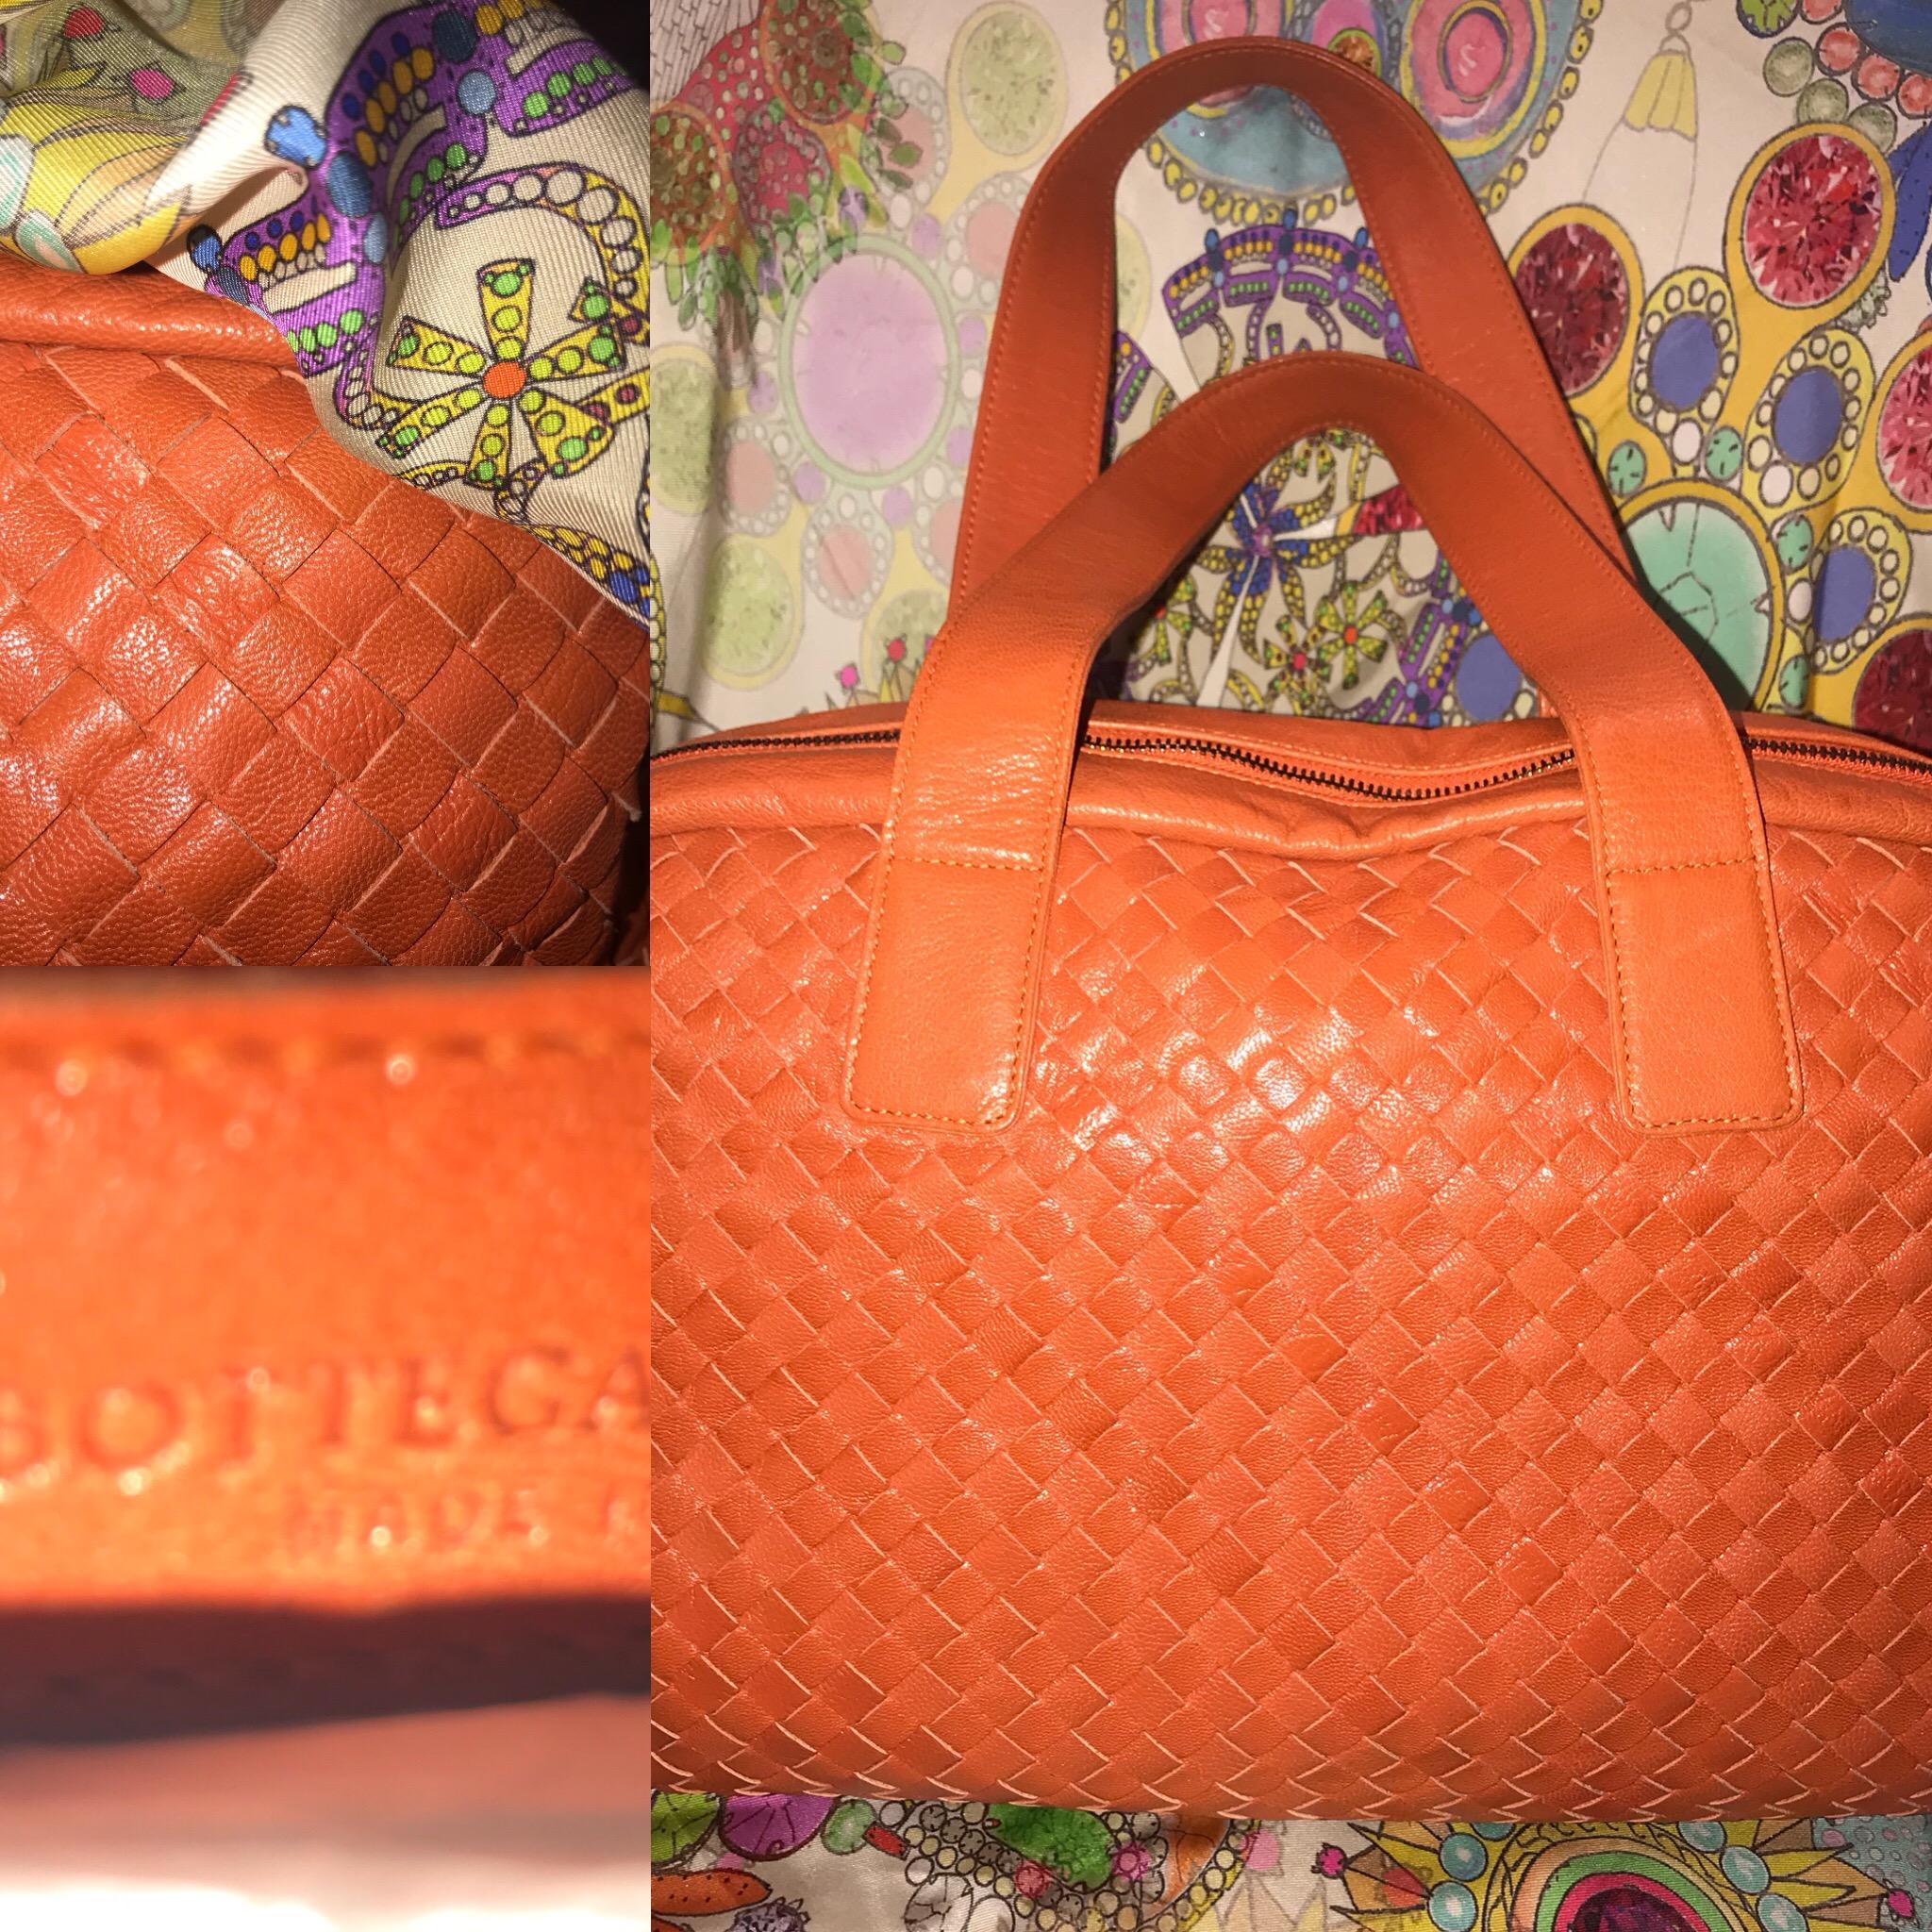 Bottega Venneta orange bag £799.JPG